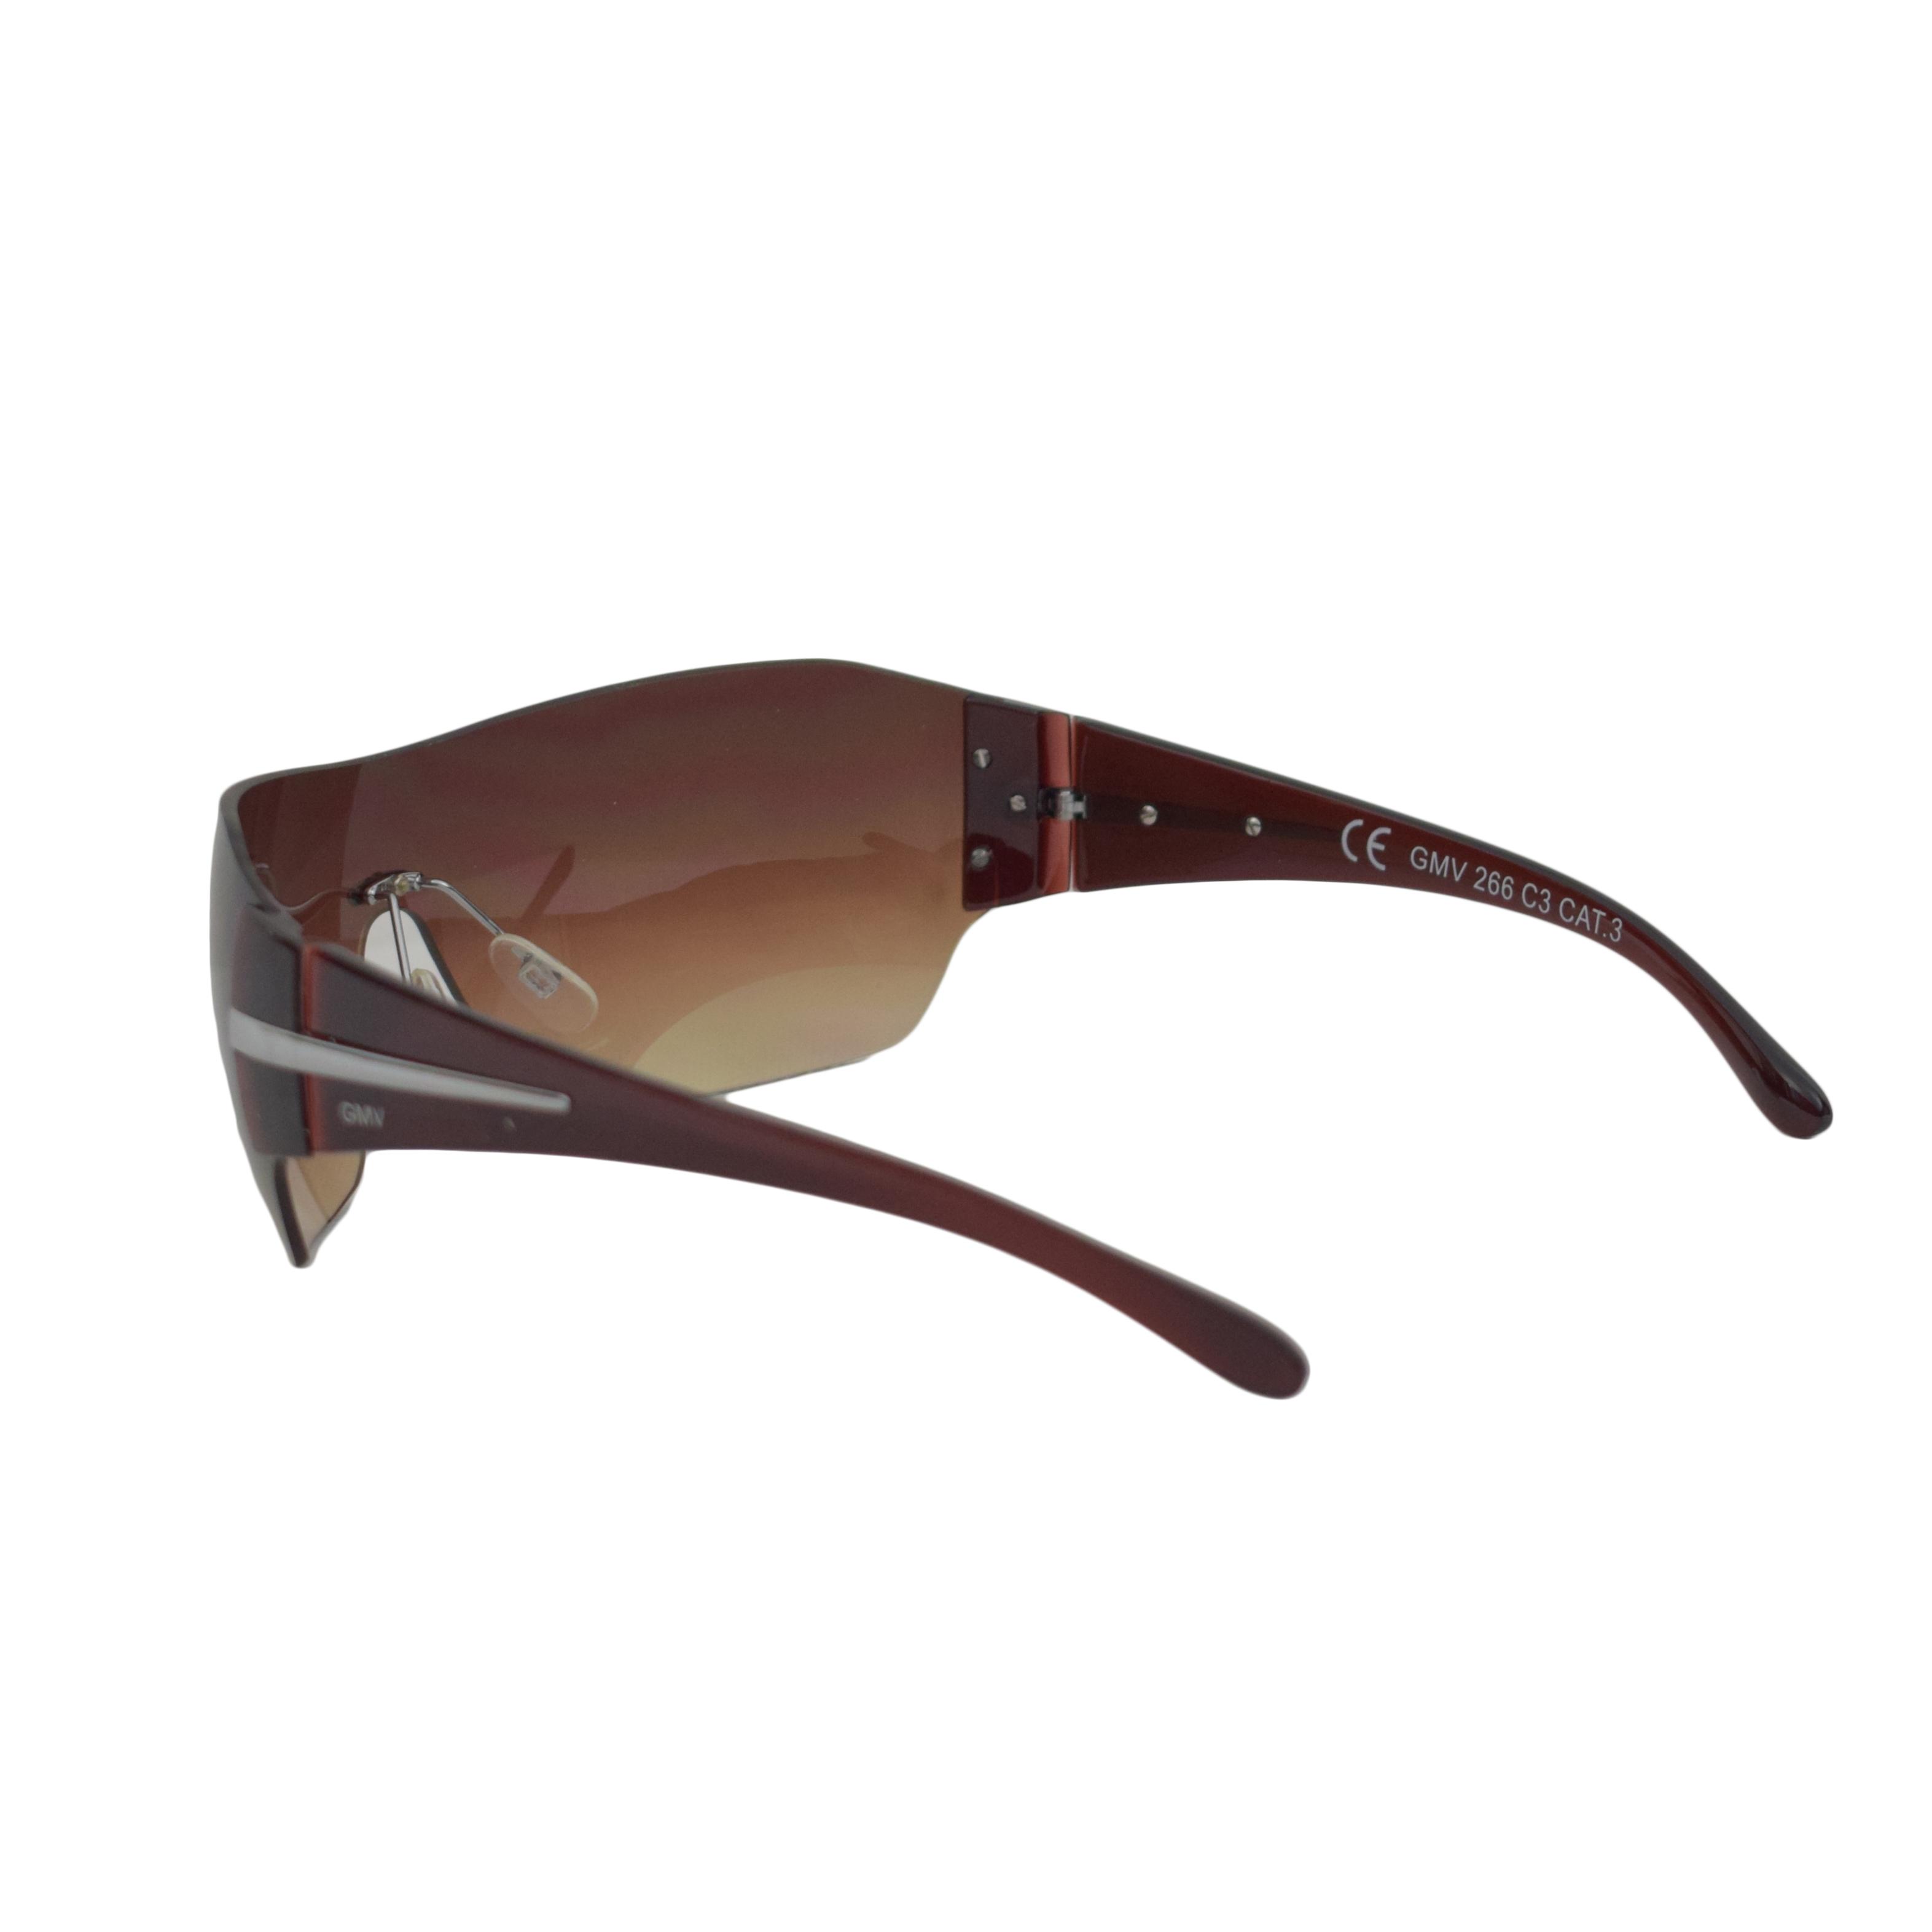 Occhiali da Sole Gian Marco Venturi - Montatura Marrone - 266C3